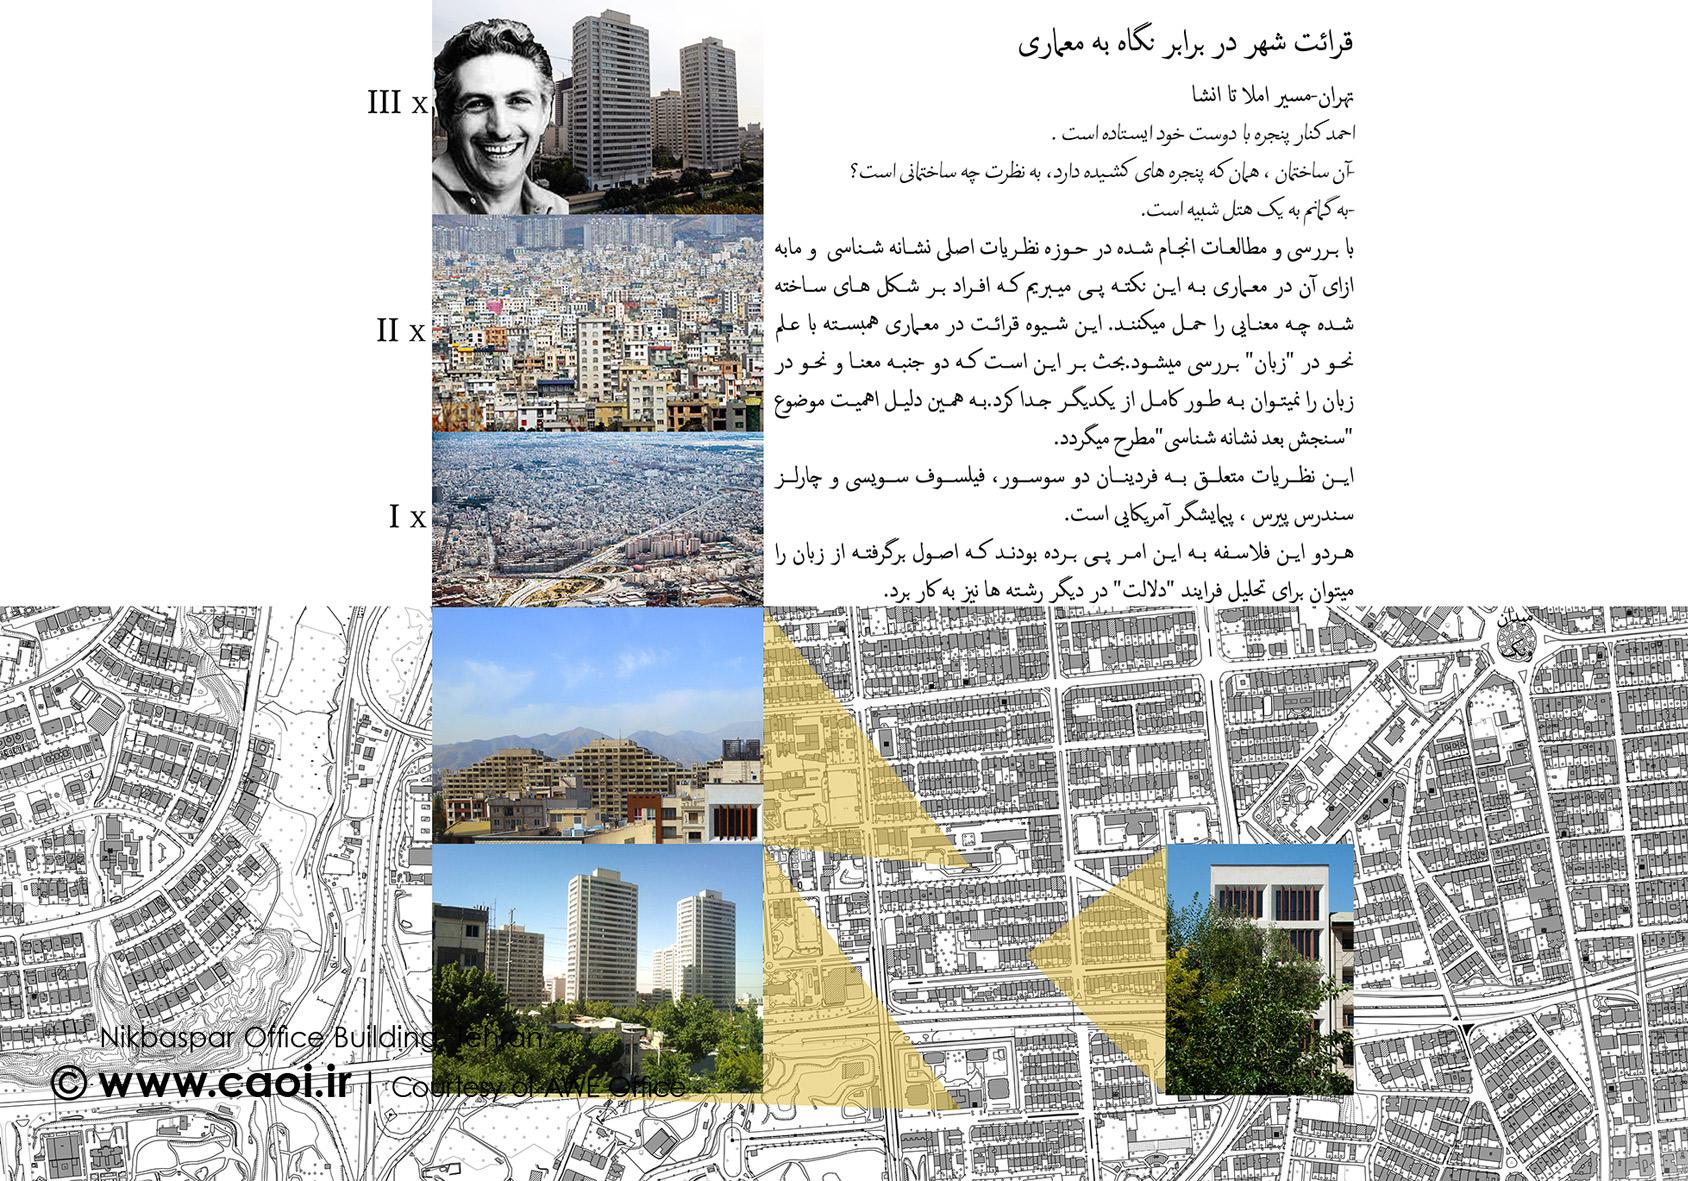 Nikbespar_Office_Building_in_Tehran__11_